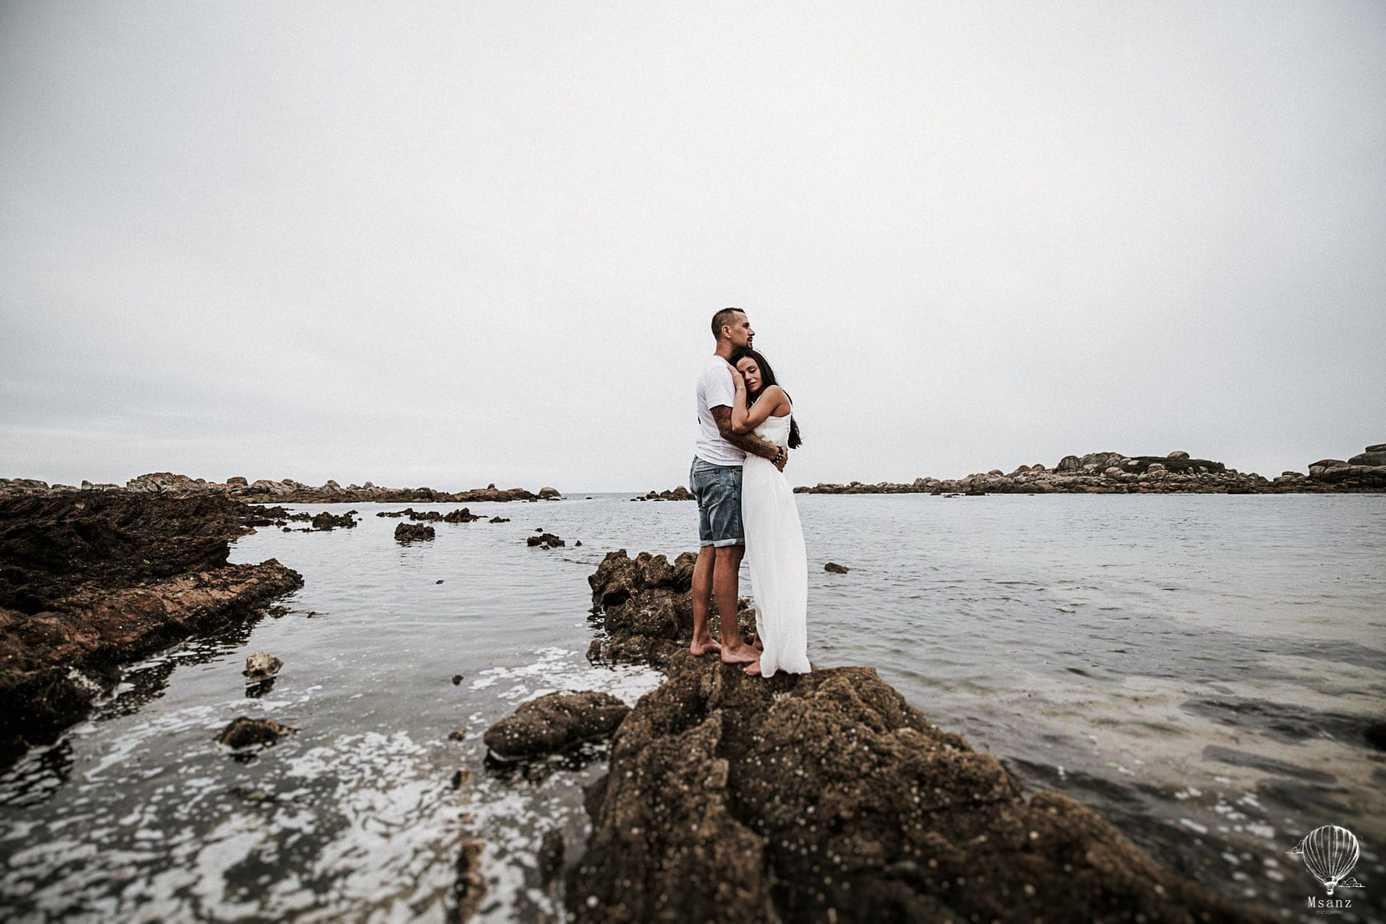 Preboda en Rías Baixas con Ángela y Óscar · Fotógrafo de Bodas